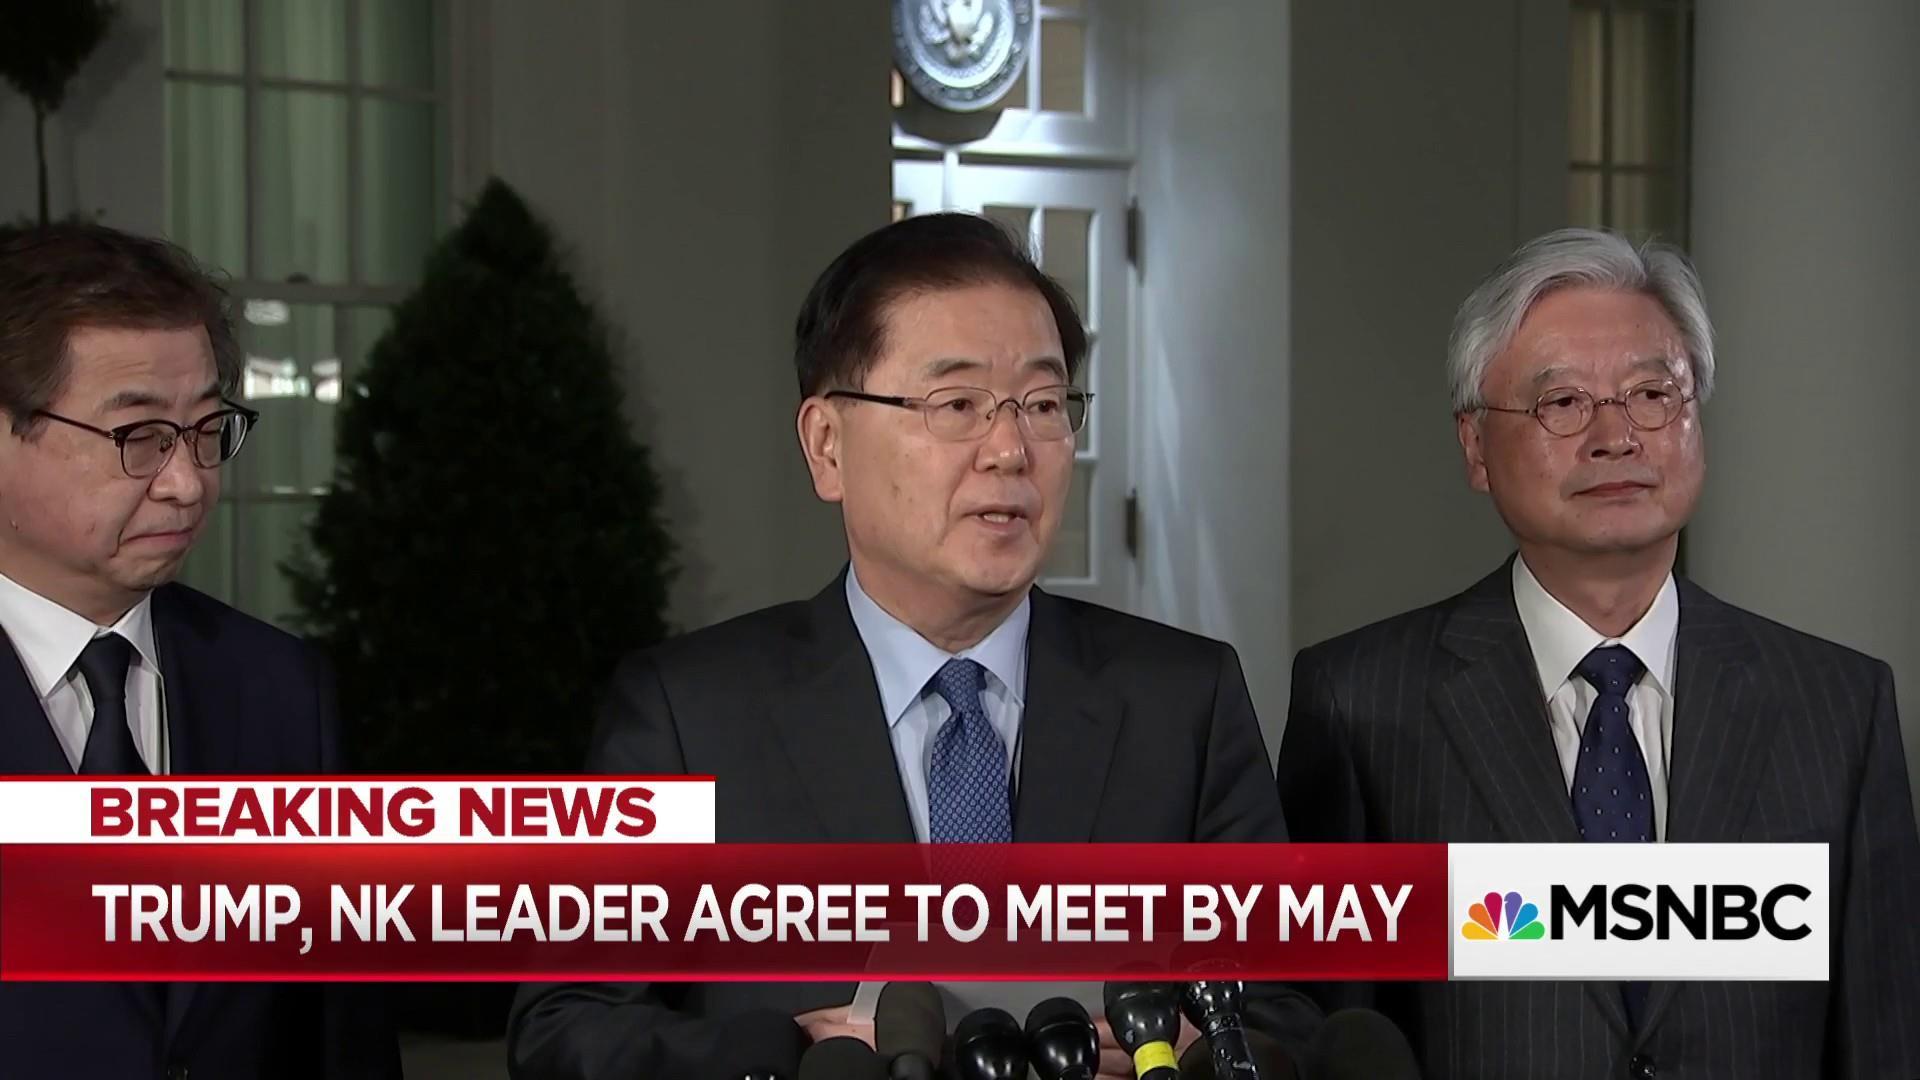 Trump meeting would end long precedent of North Korea as pariah